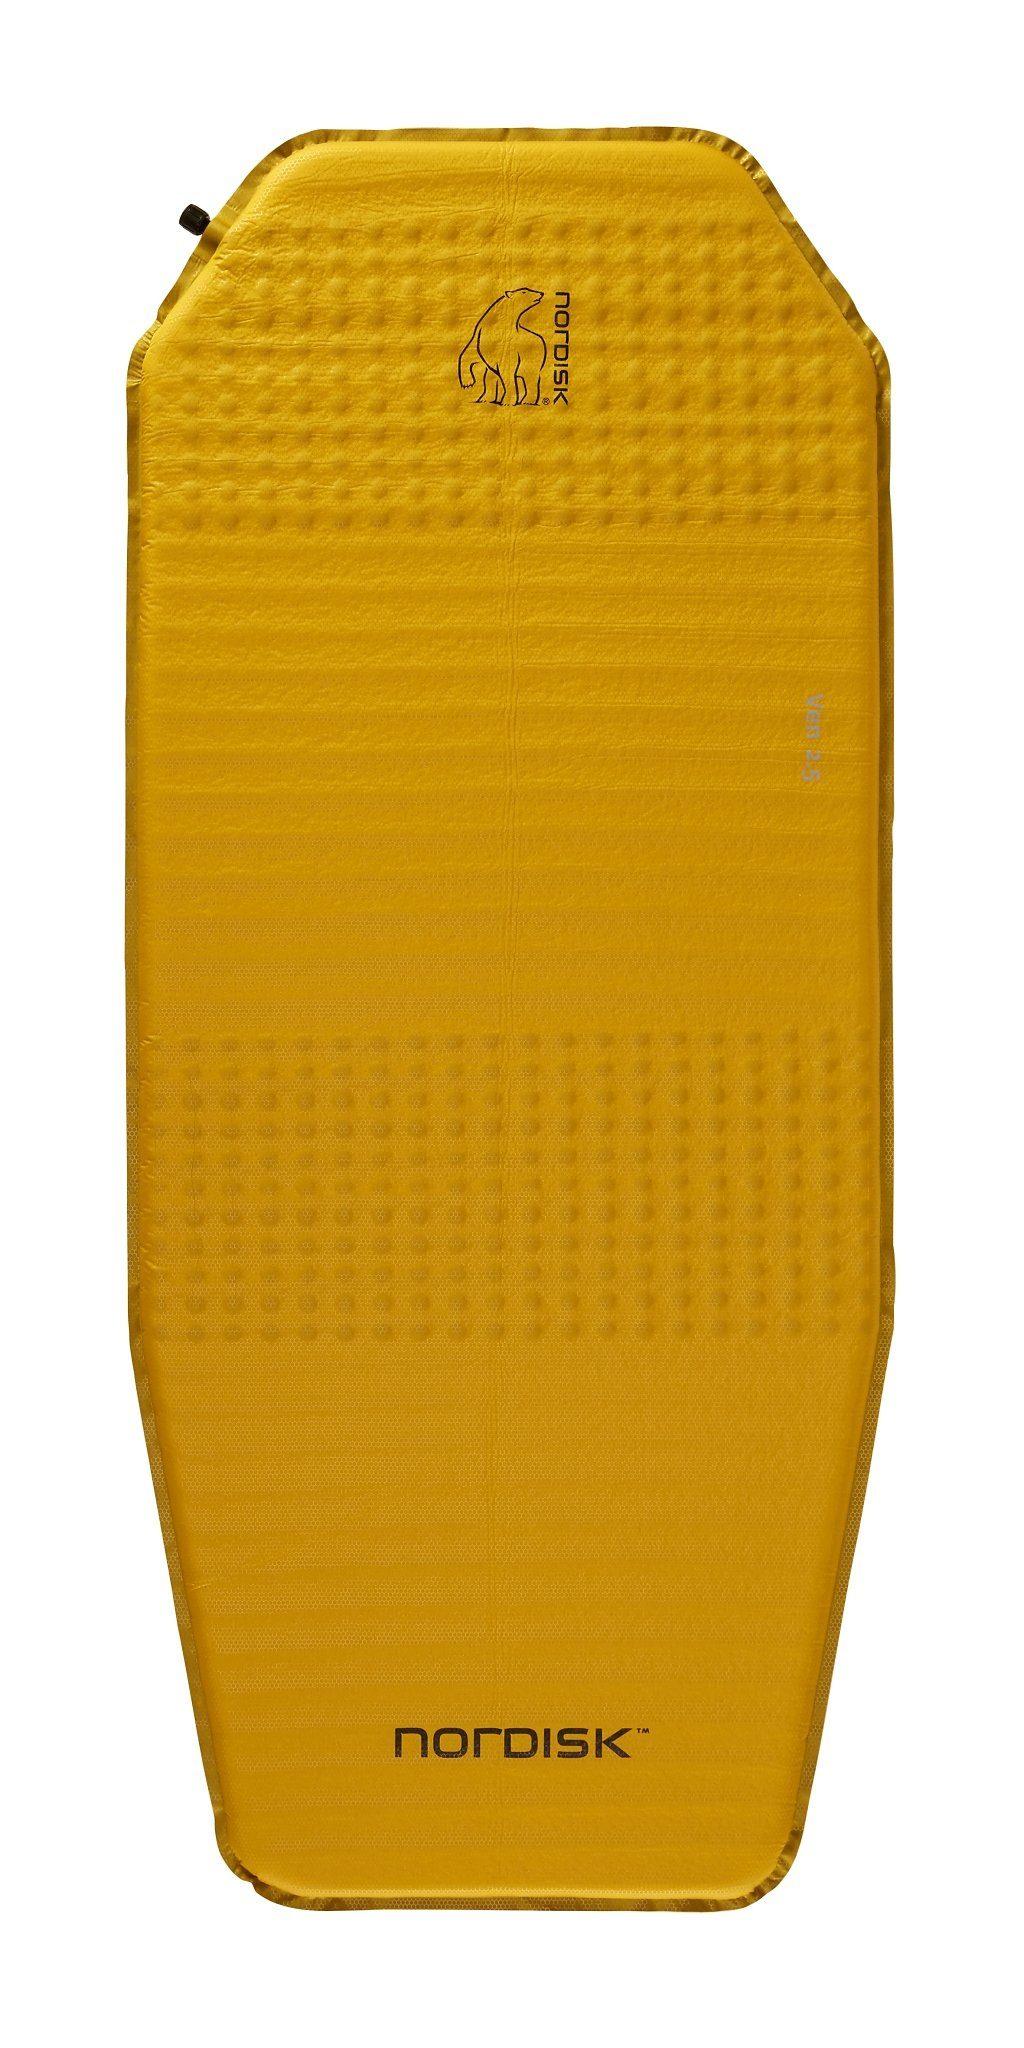 Nordisk Luftmatratze »Ven 2.5 Self-Inflatable Mat«